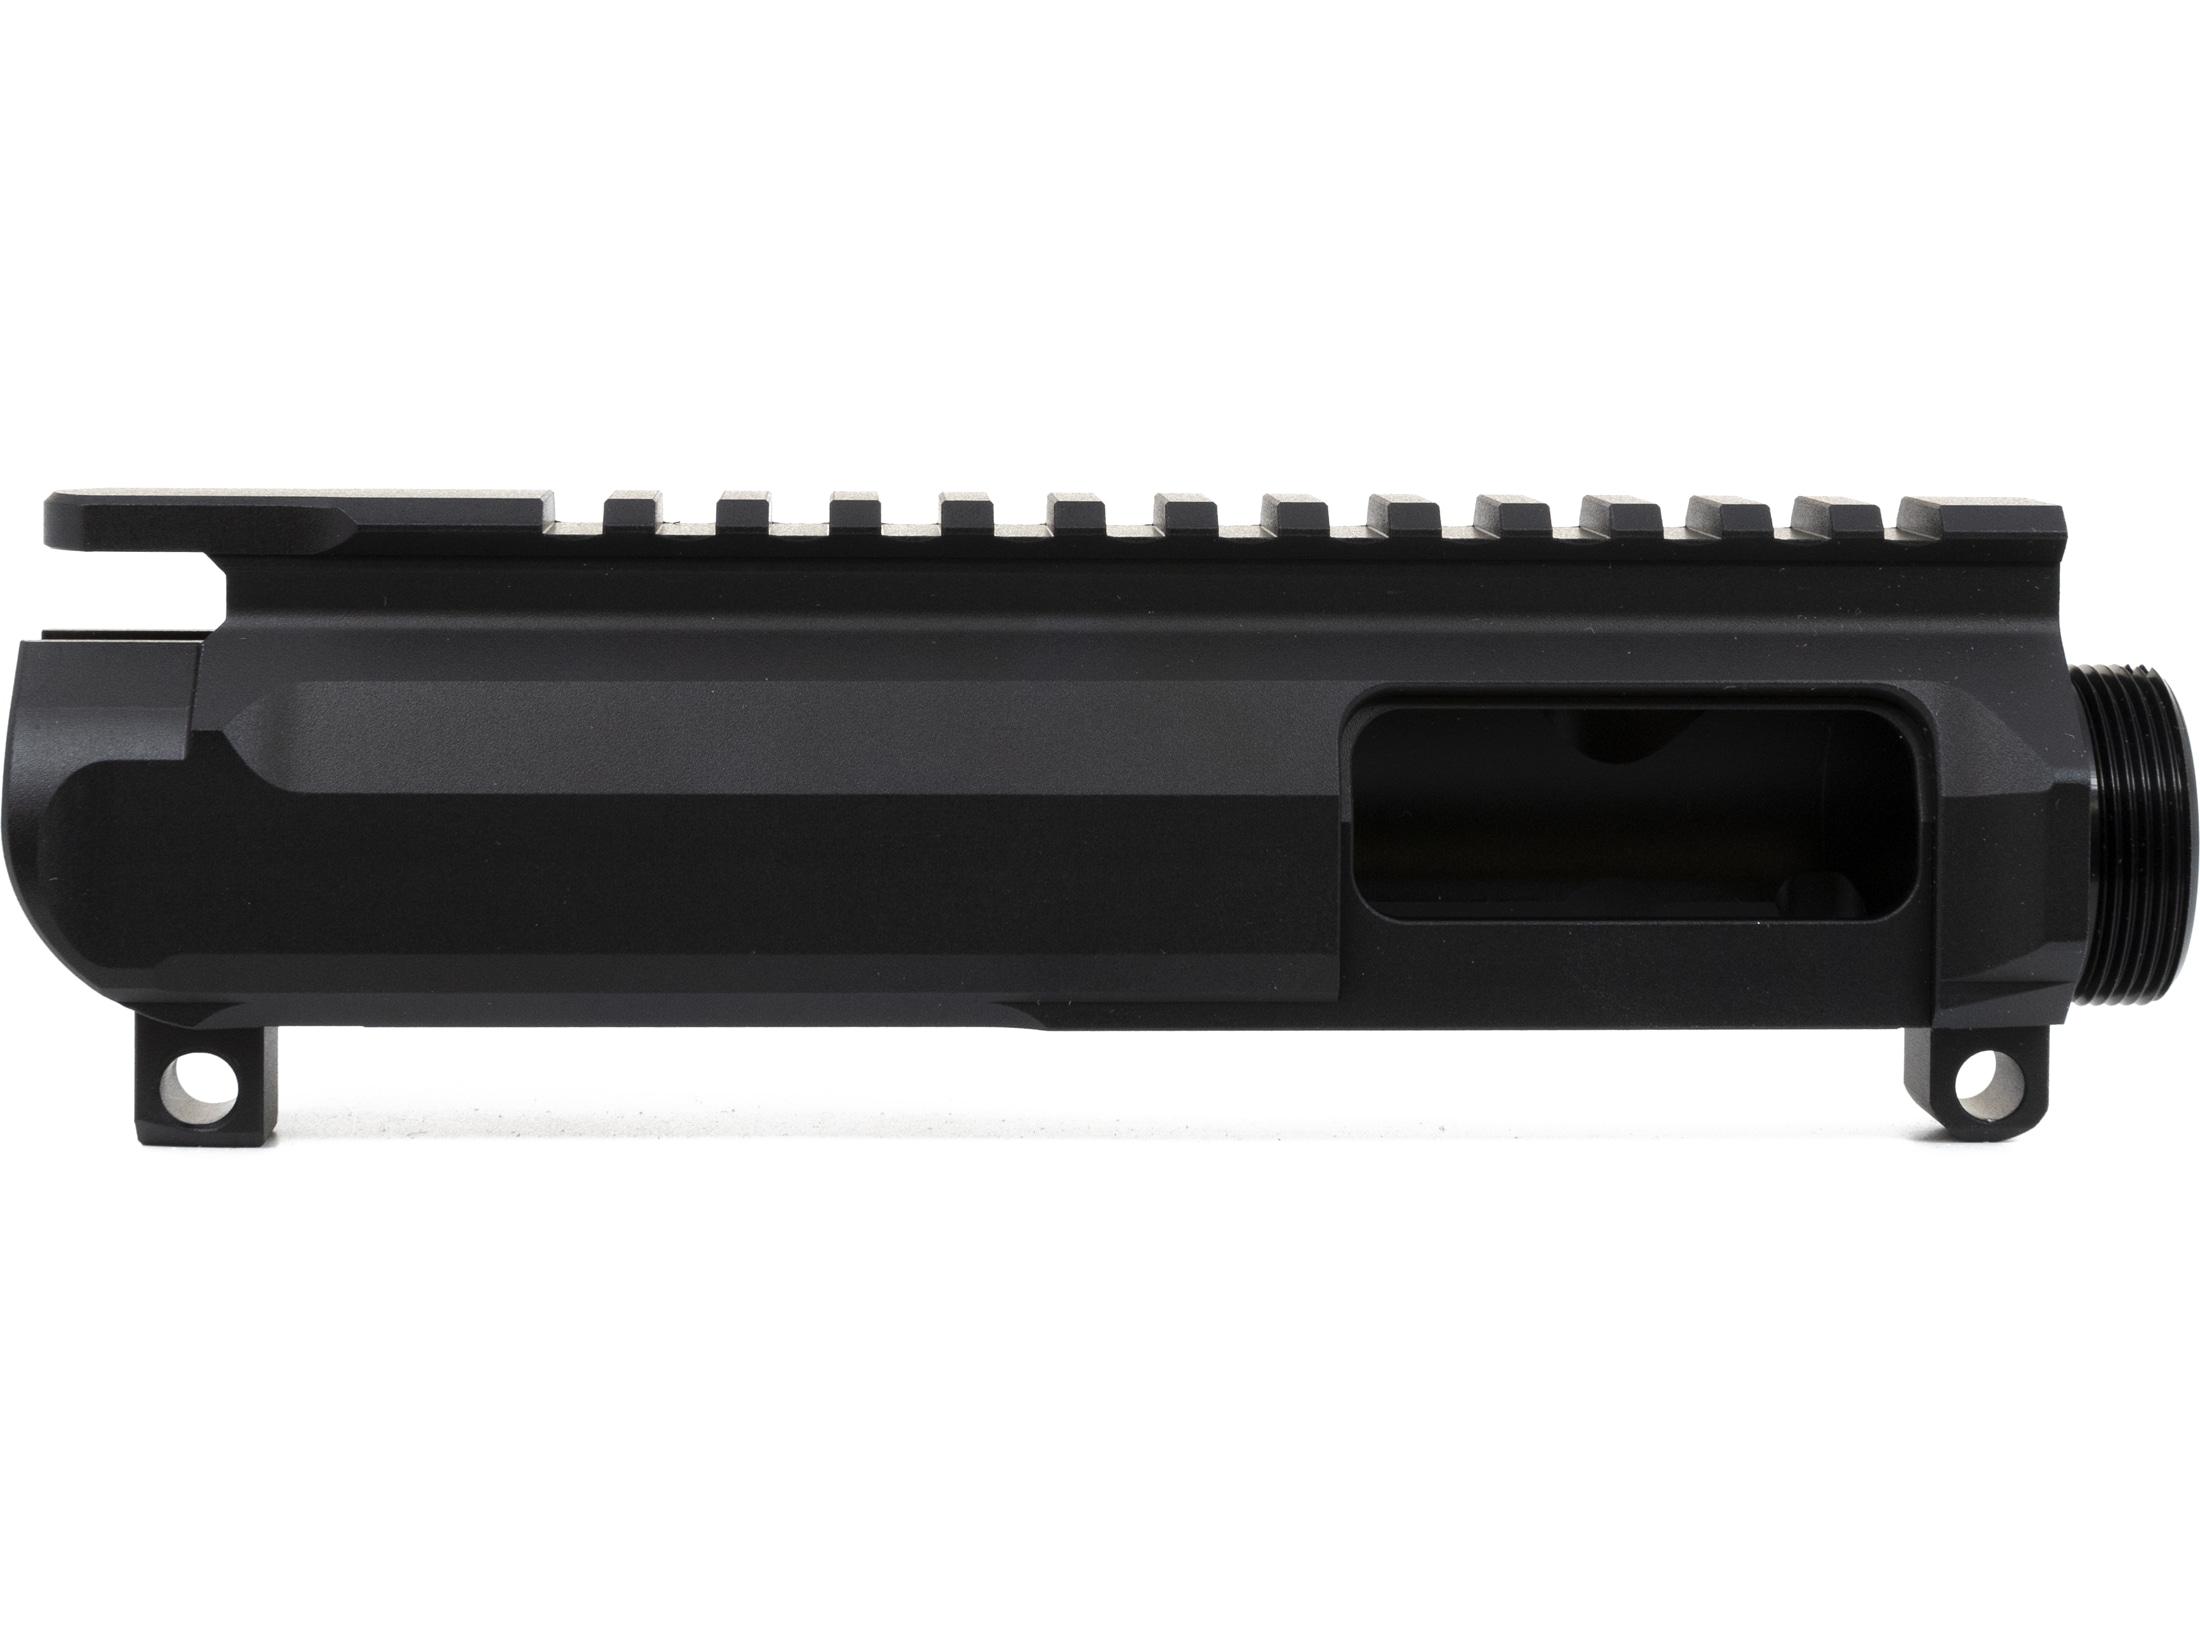 AR-STONER 80% Glock Mag Lower Receiver AR-15 45 ACP Aluminum Anodized